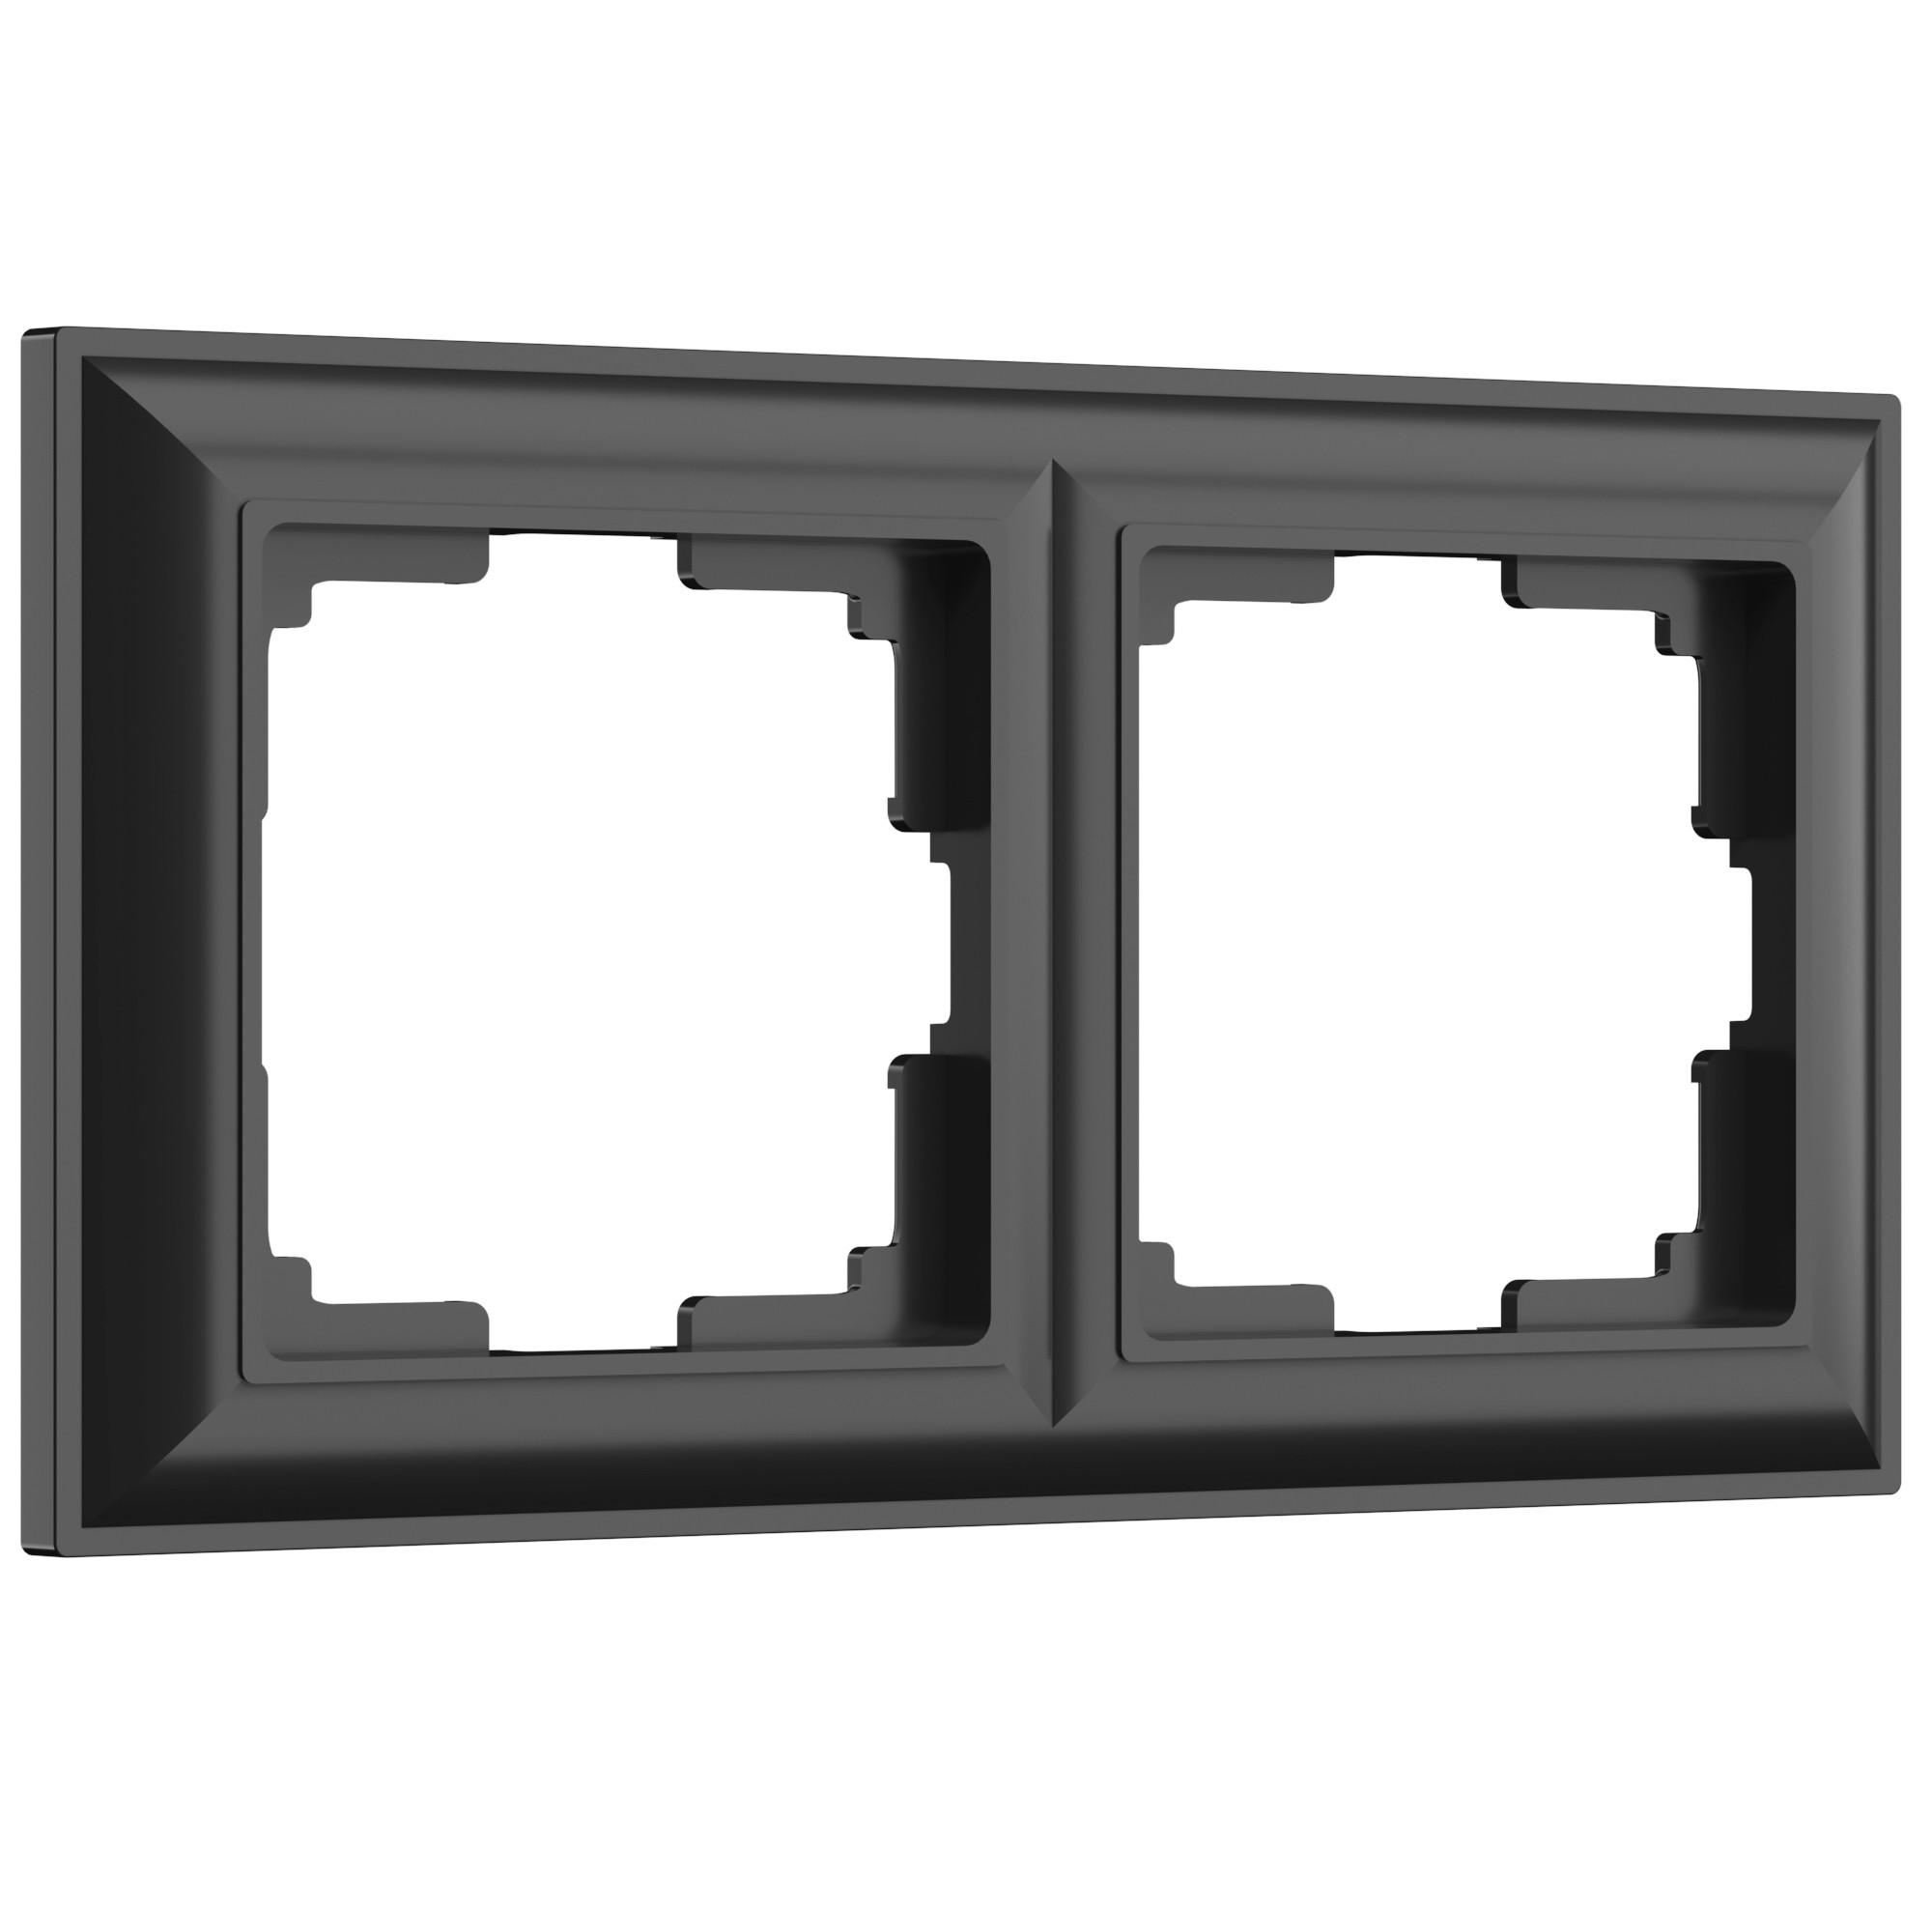 WL14-Frame-02/ Рамка на 2 поста (черный матовый)